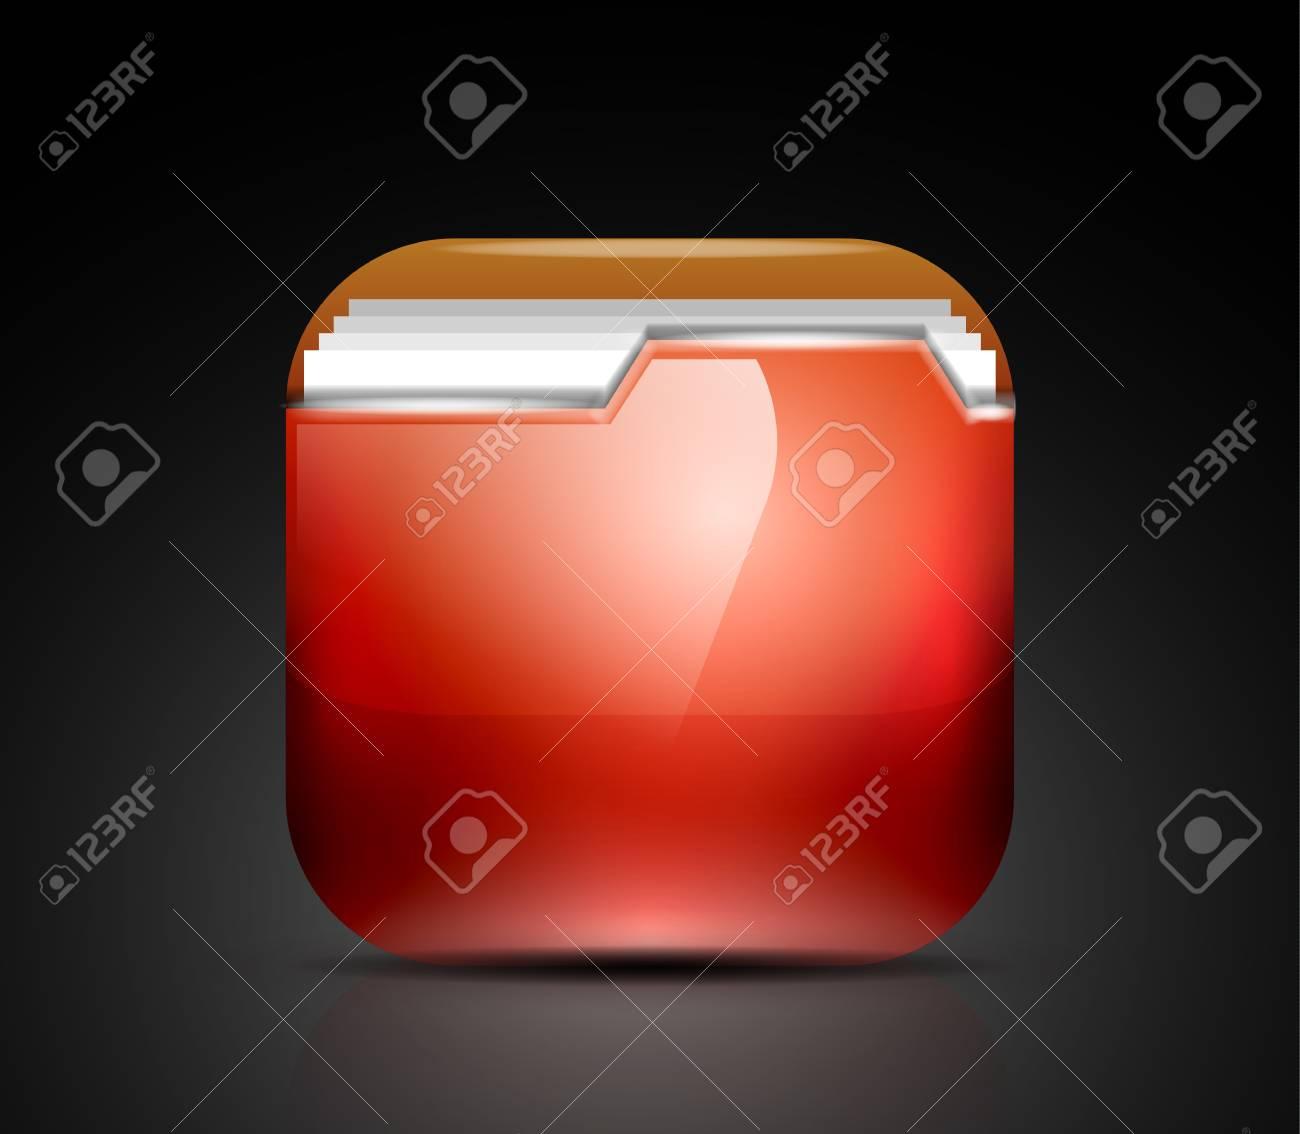 Glossy folder icon Stock Vector - 19008591